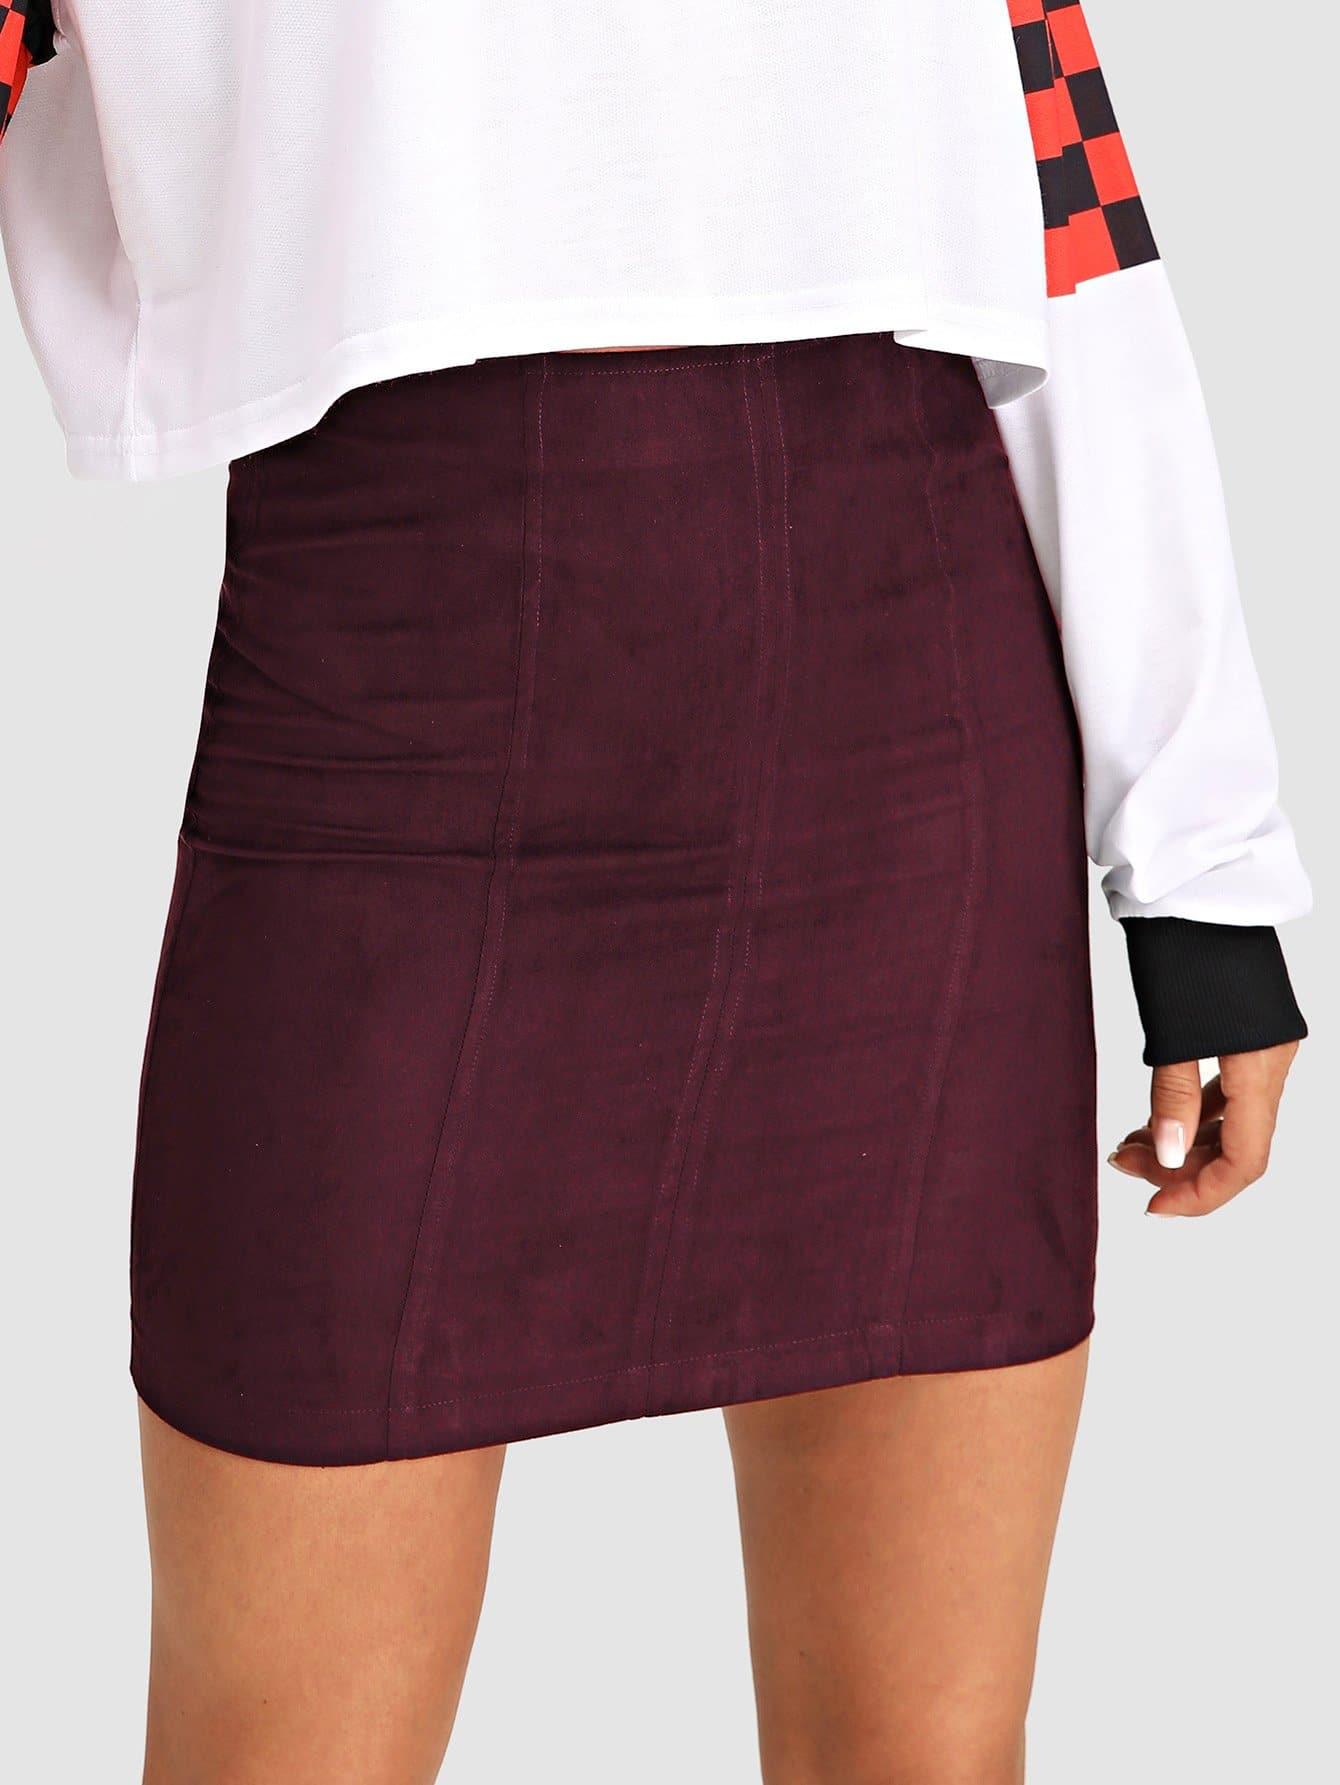 Фото - Одноцветная юбка на молнии от SheIn бордового цвета